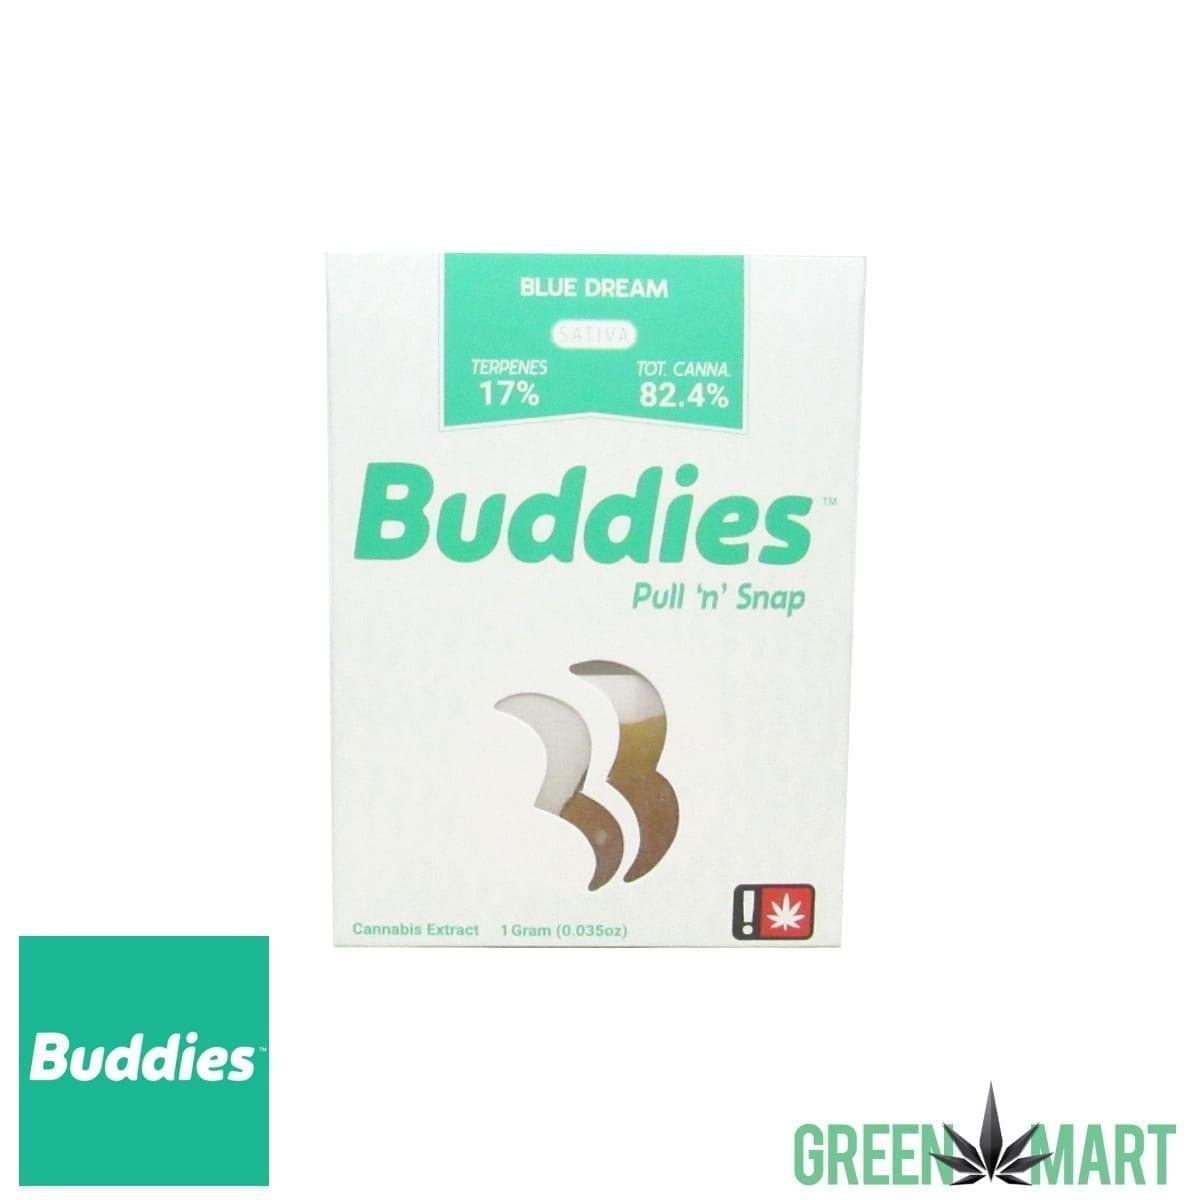 Buddies Brand Pull 'n' Snap - Blue Dream